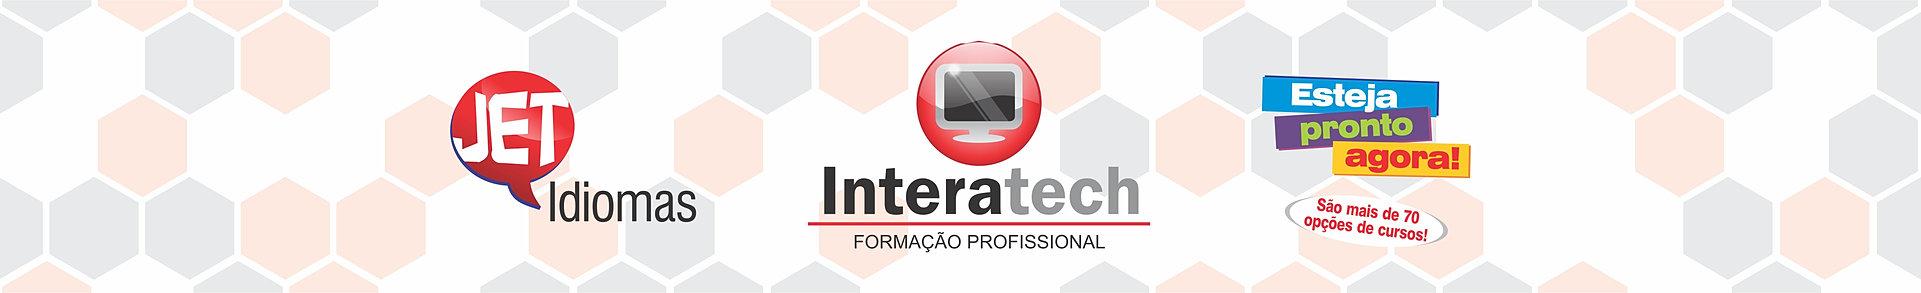 Cursos,Excel,excel avançado,prepara cursos,microlins,microcamp,eurodata,Auto CAD, profissionalizante